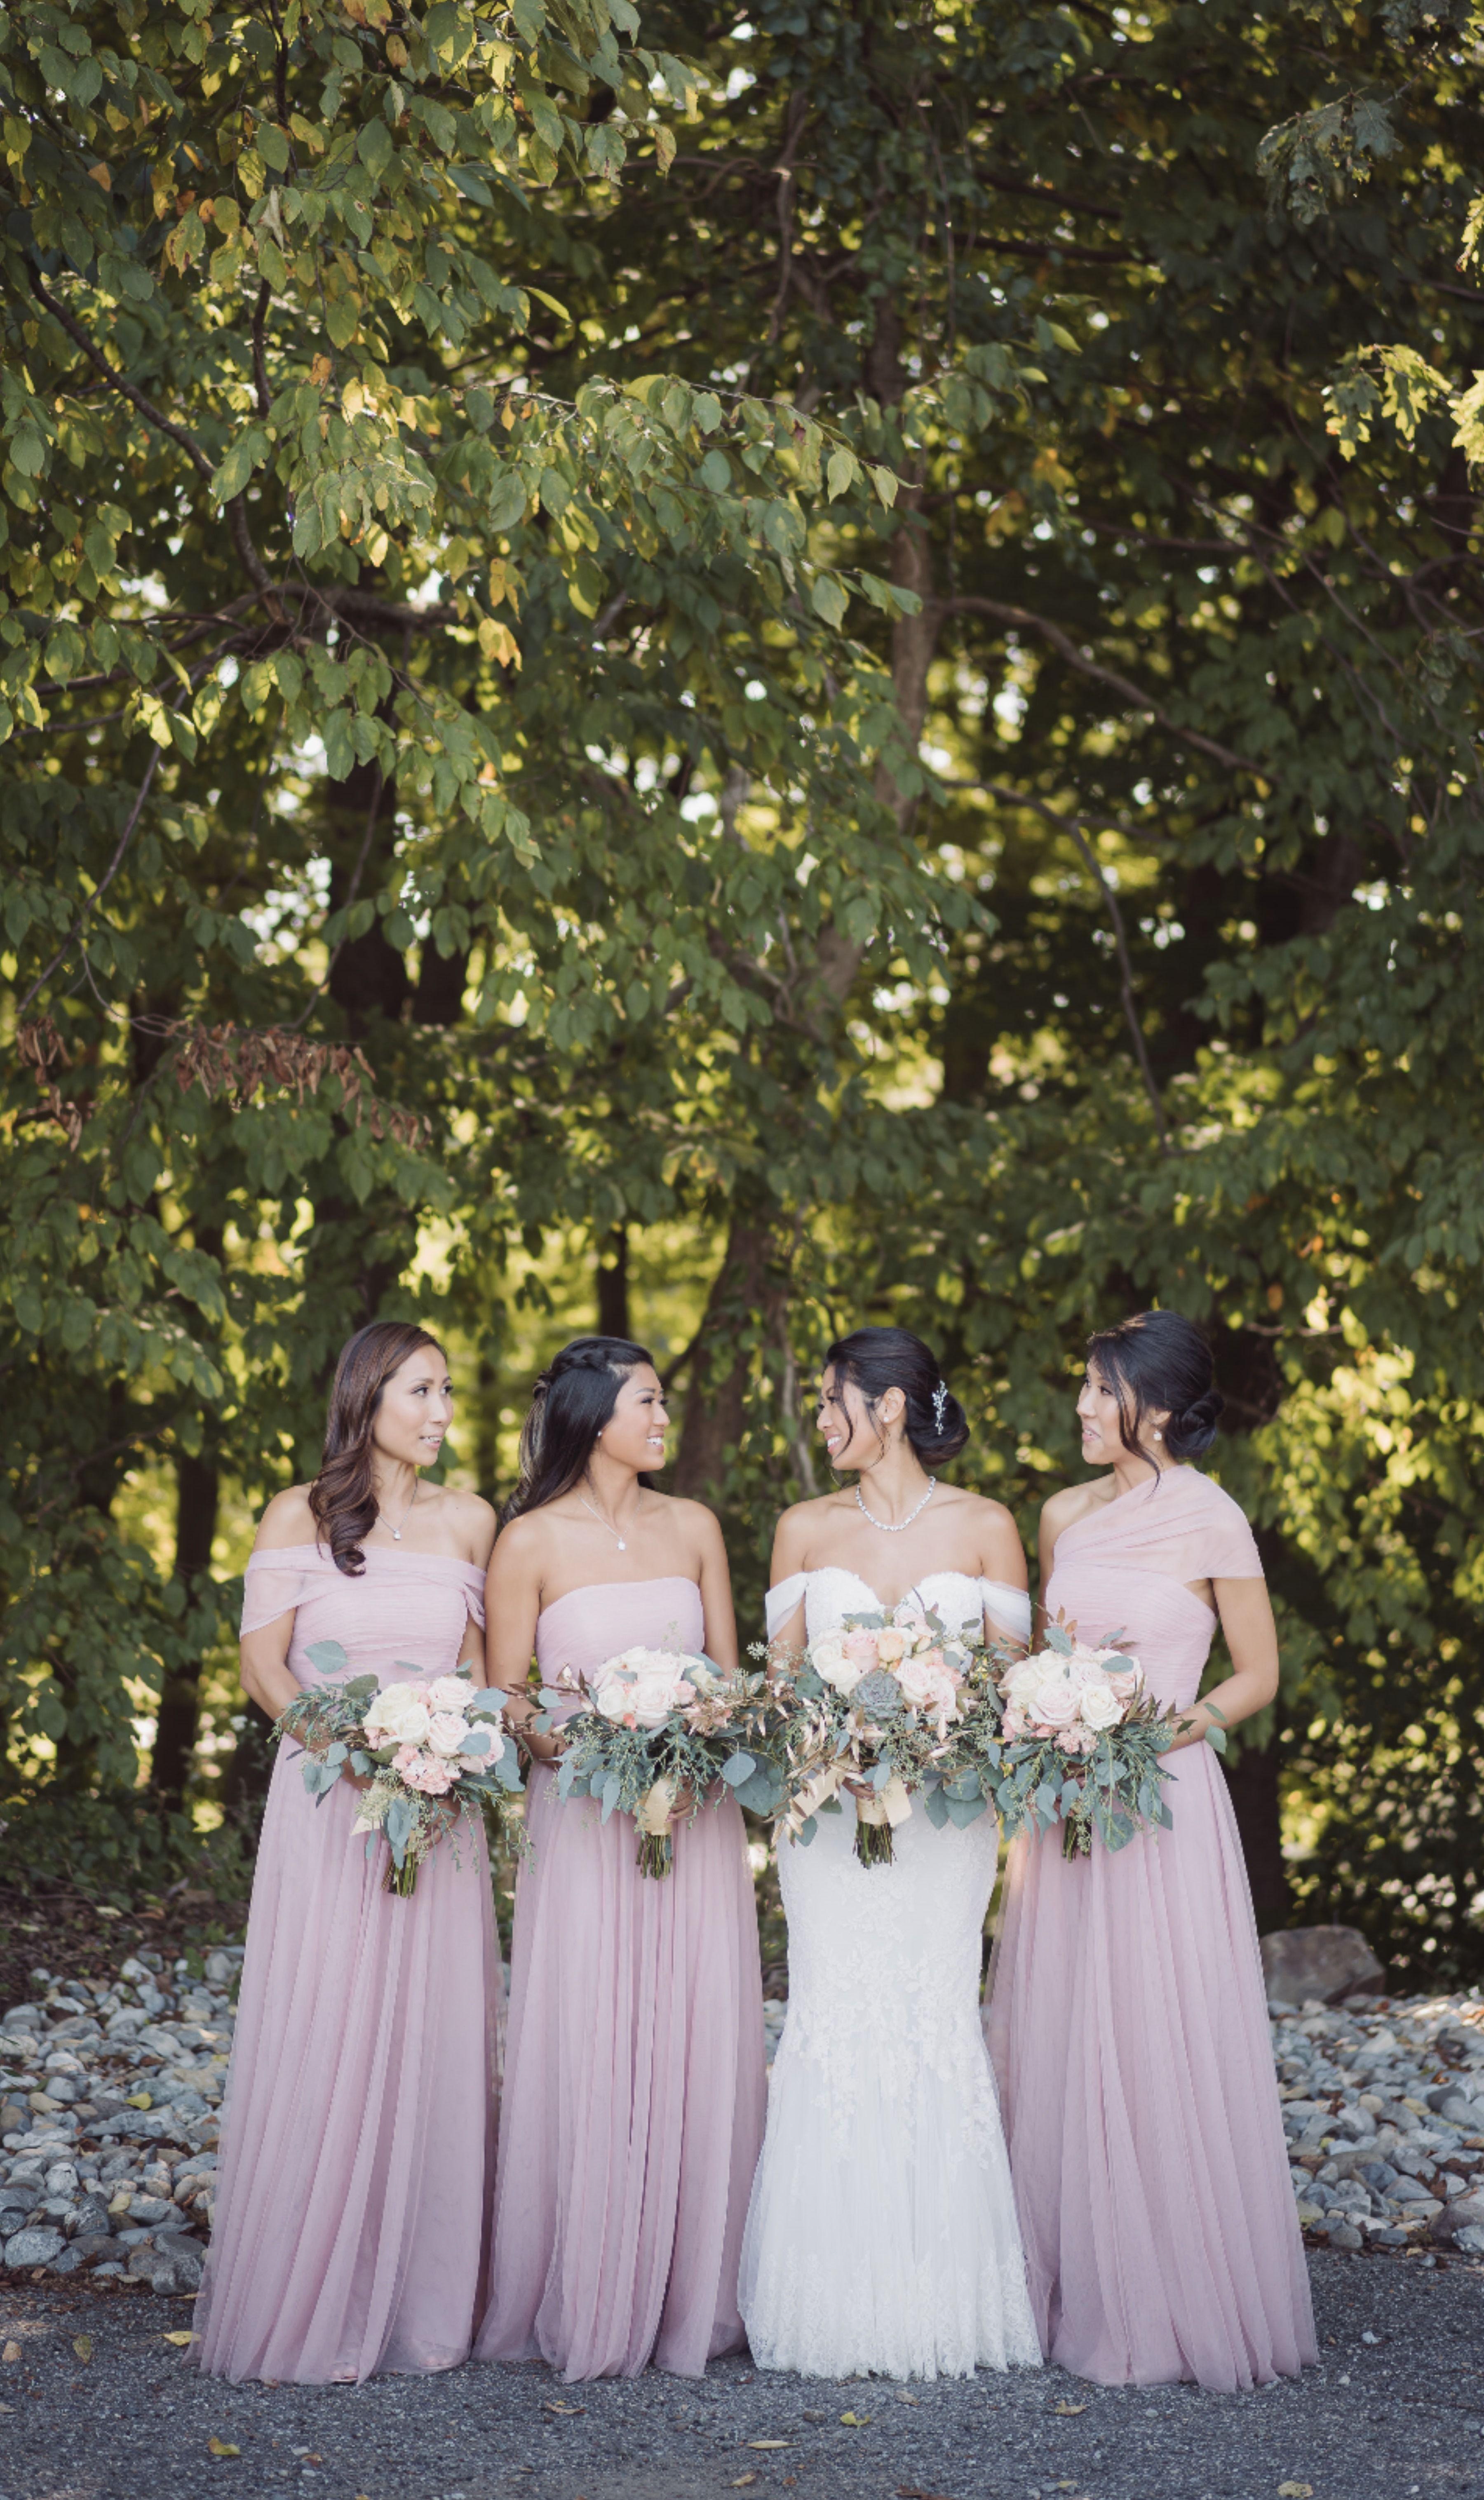 Light pink/purple bridesmaids dresses